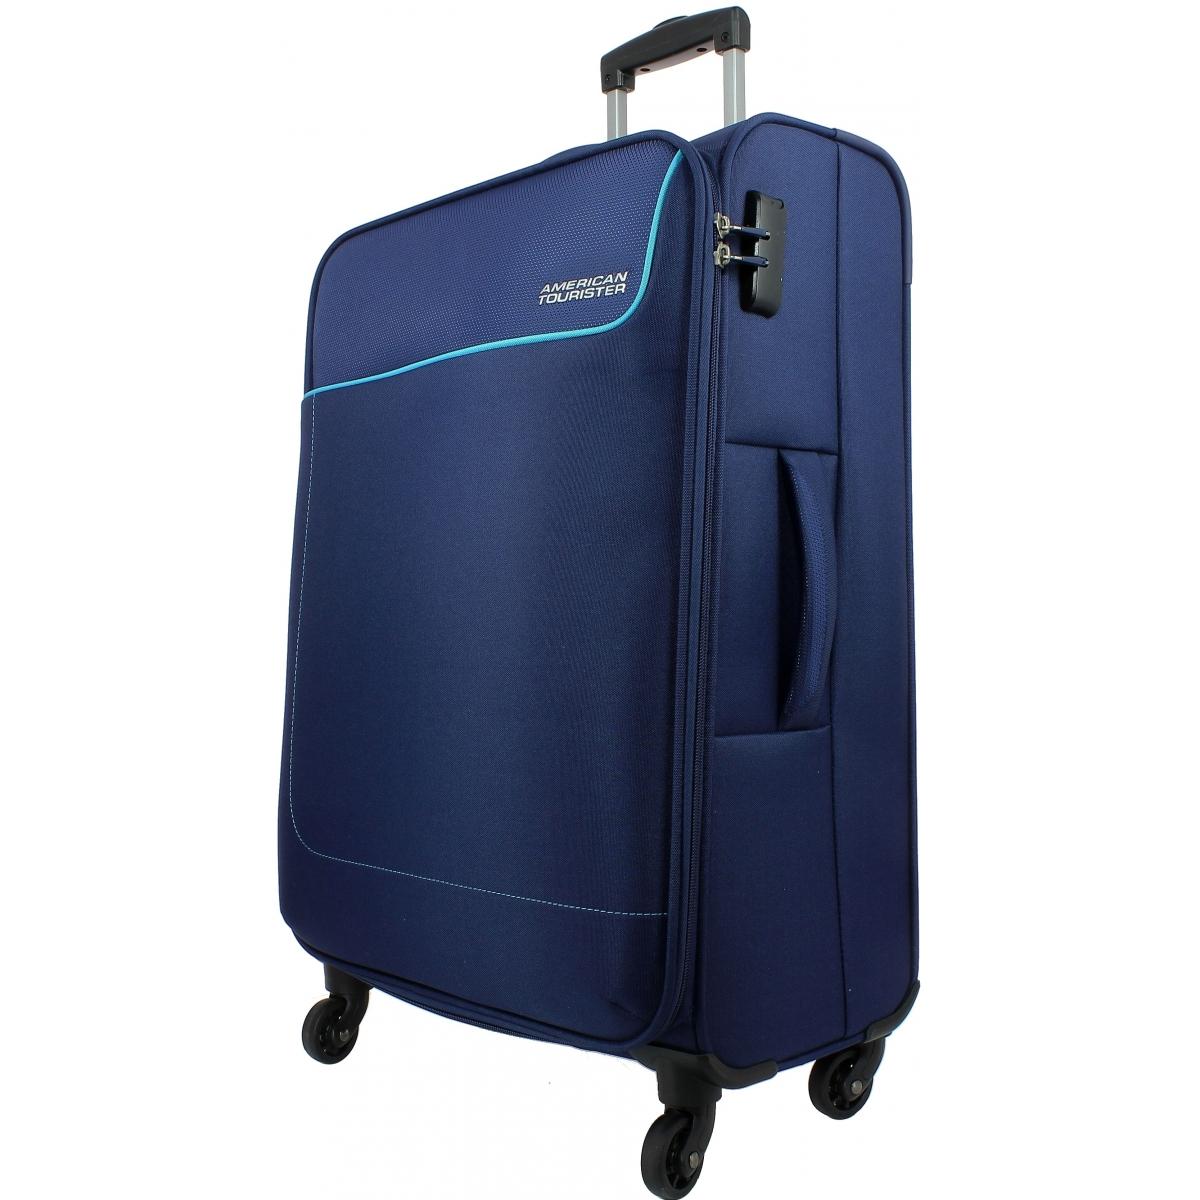 valise american tourister funshine spinner l 79 cm funshine09 couleur principale orion. Black Bedroom Furniture Sets. Home Design Ideas